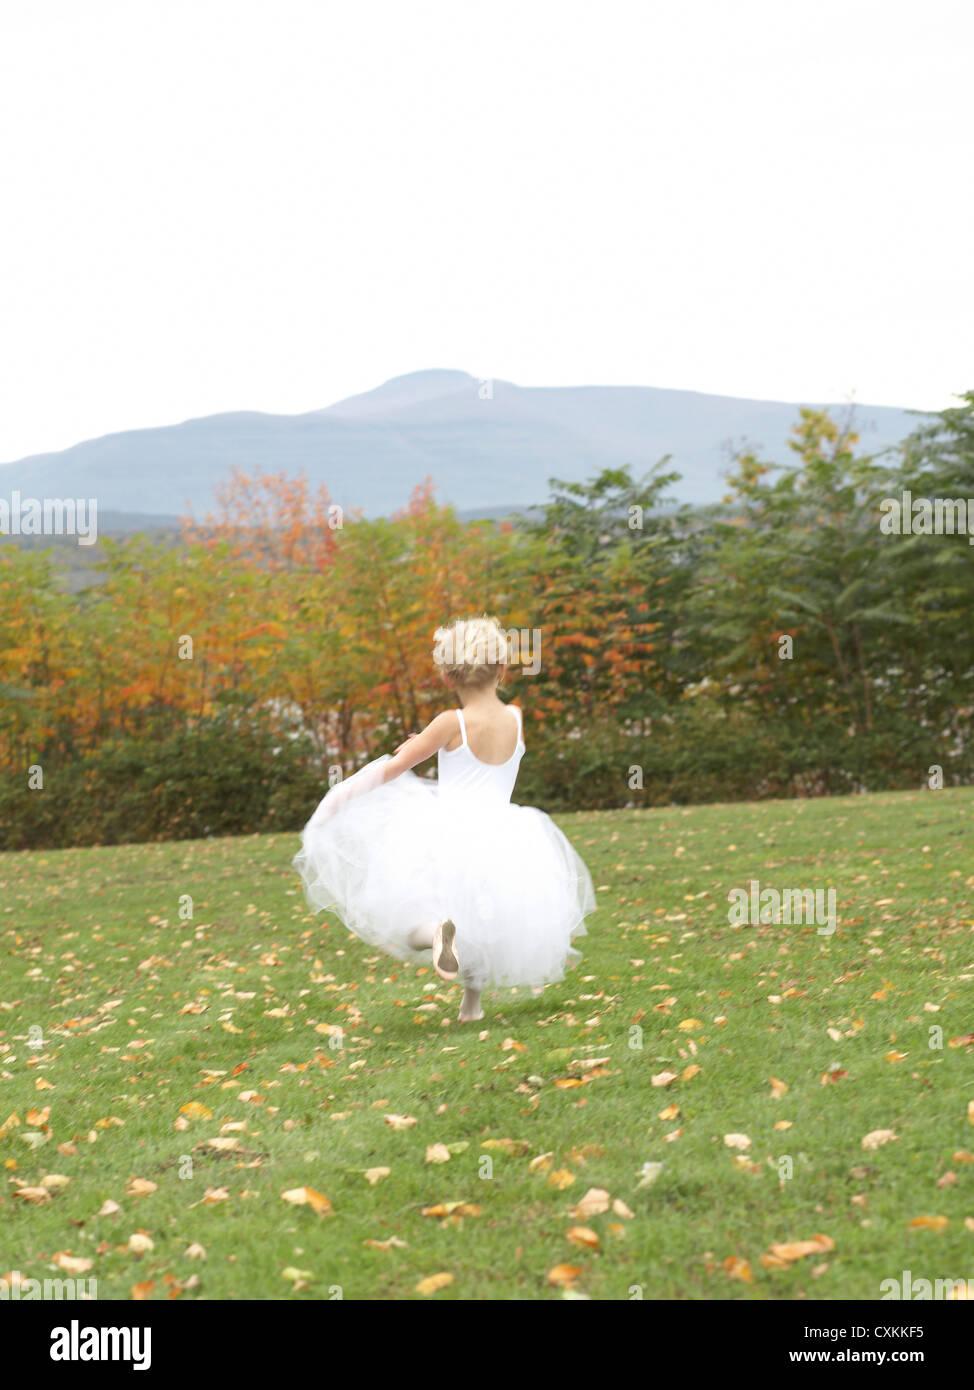 girl running in ballet costume in field - Stock Image